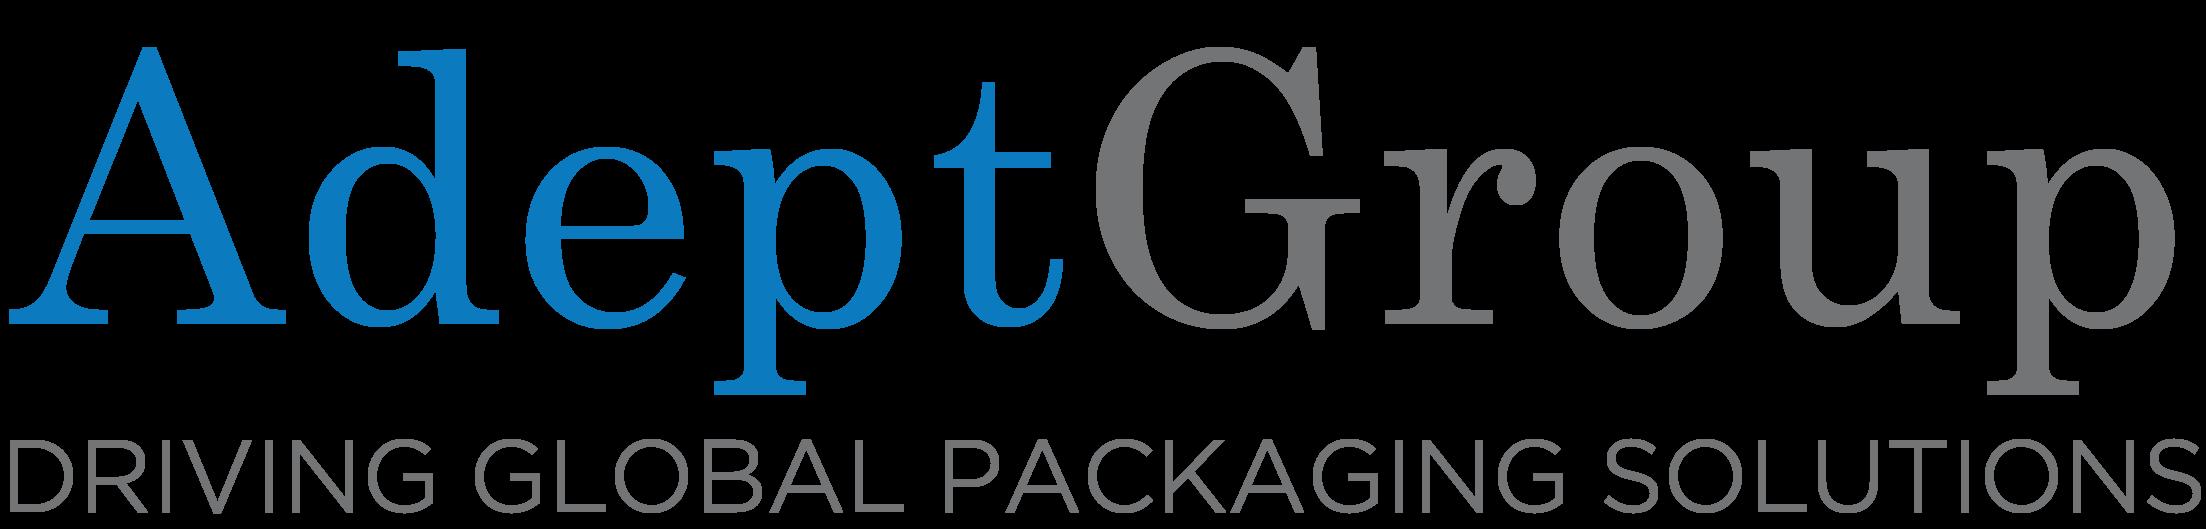 Adept Packaging Company Logo